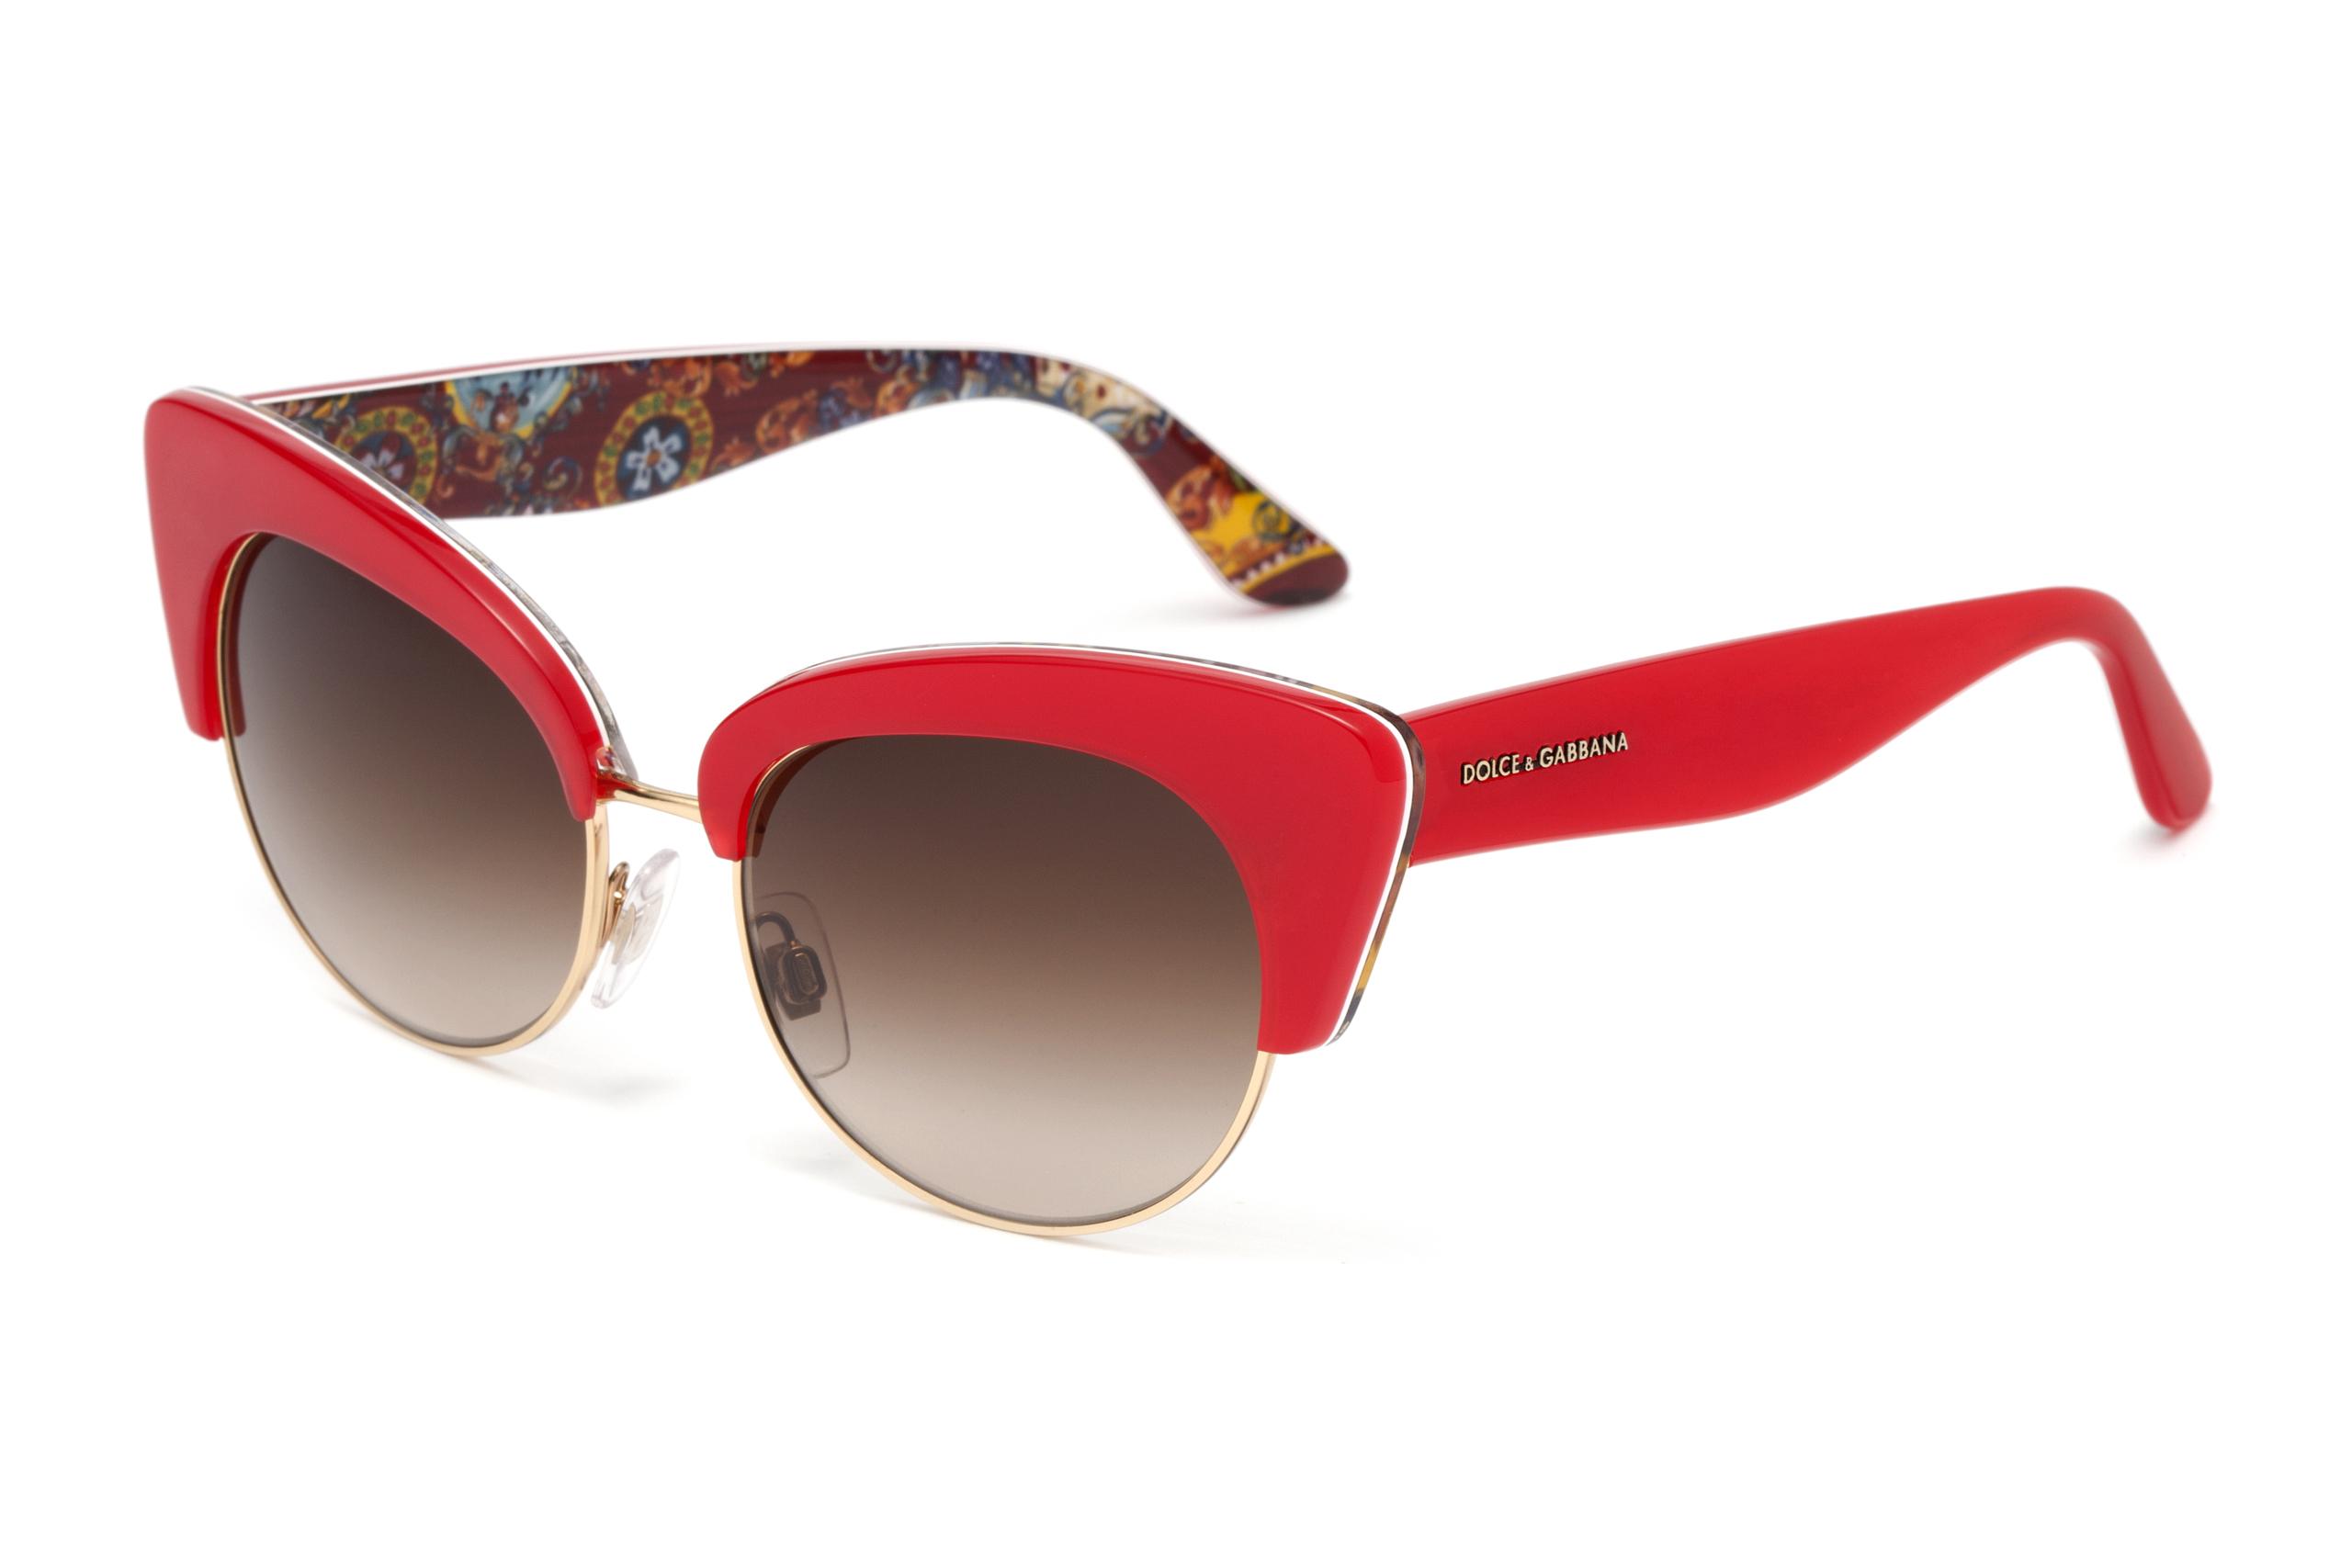 Foto de Gafas de sol Dolce Gabbana Sicilian Carretto (2/12)